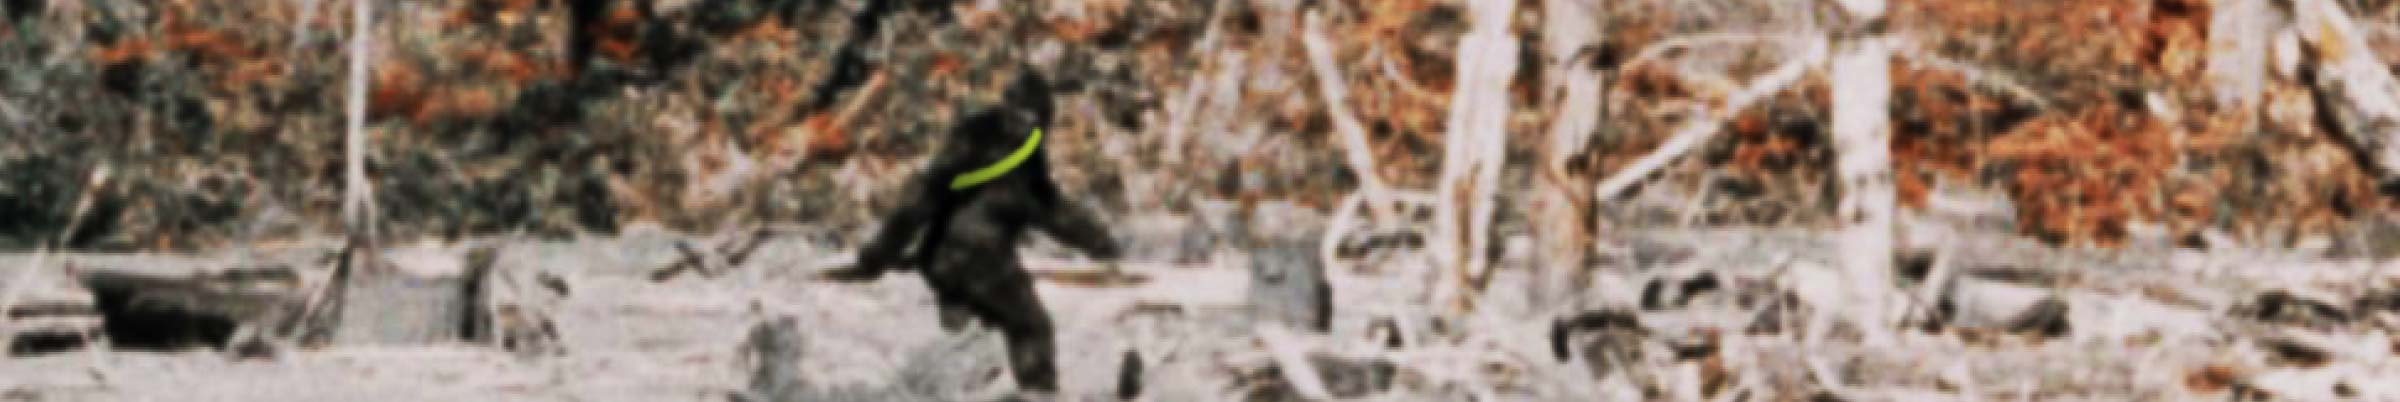 Moonsash-bigfoot